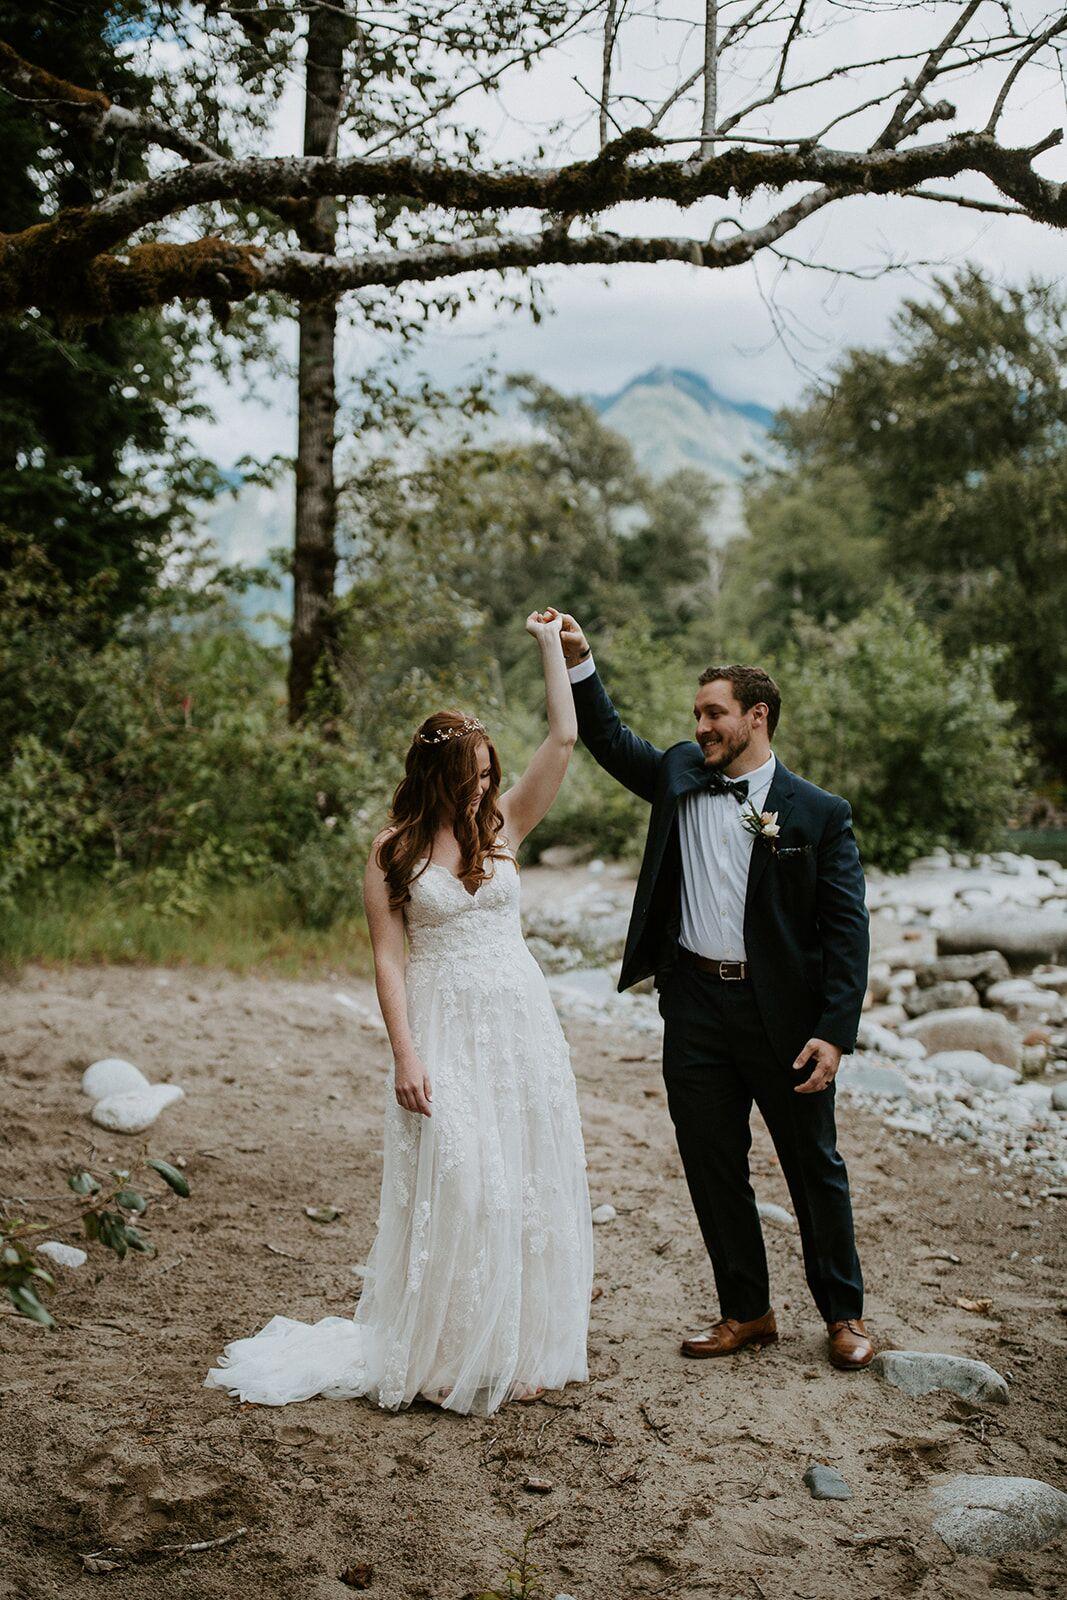 Blue-Sky-Ranch-Wedding-Block-Weddings-and-Events11.jpeg